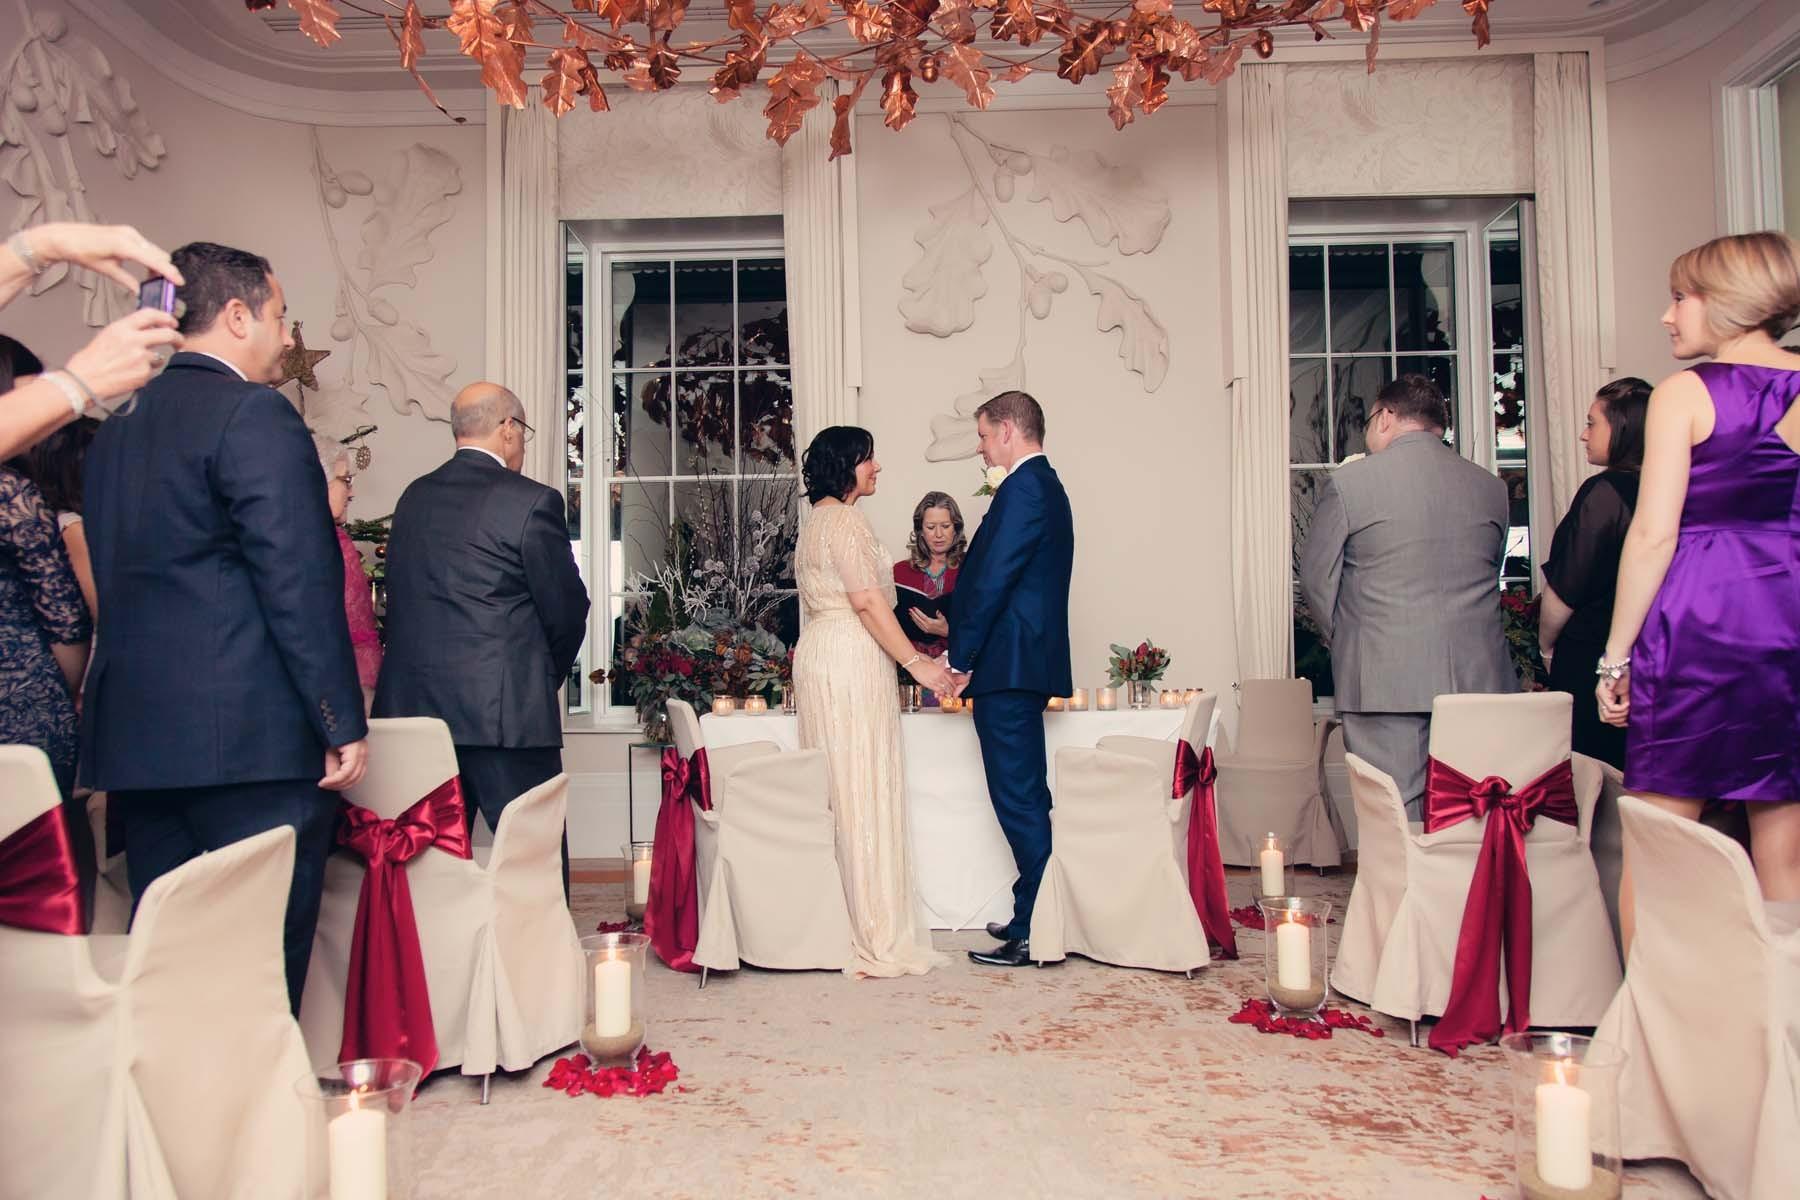 Sussex & Surrey Wedding Photographer - Ceremony (14)